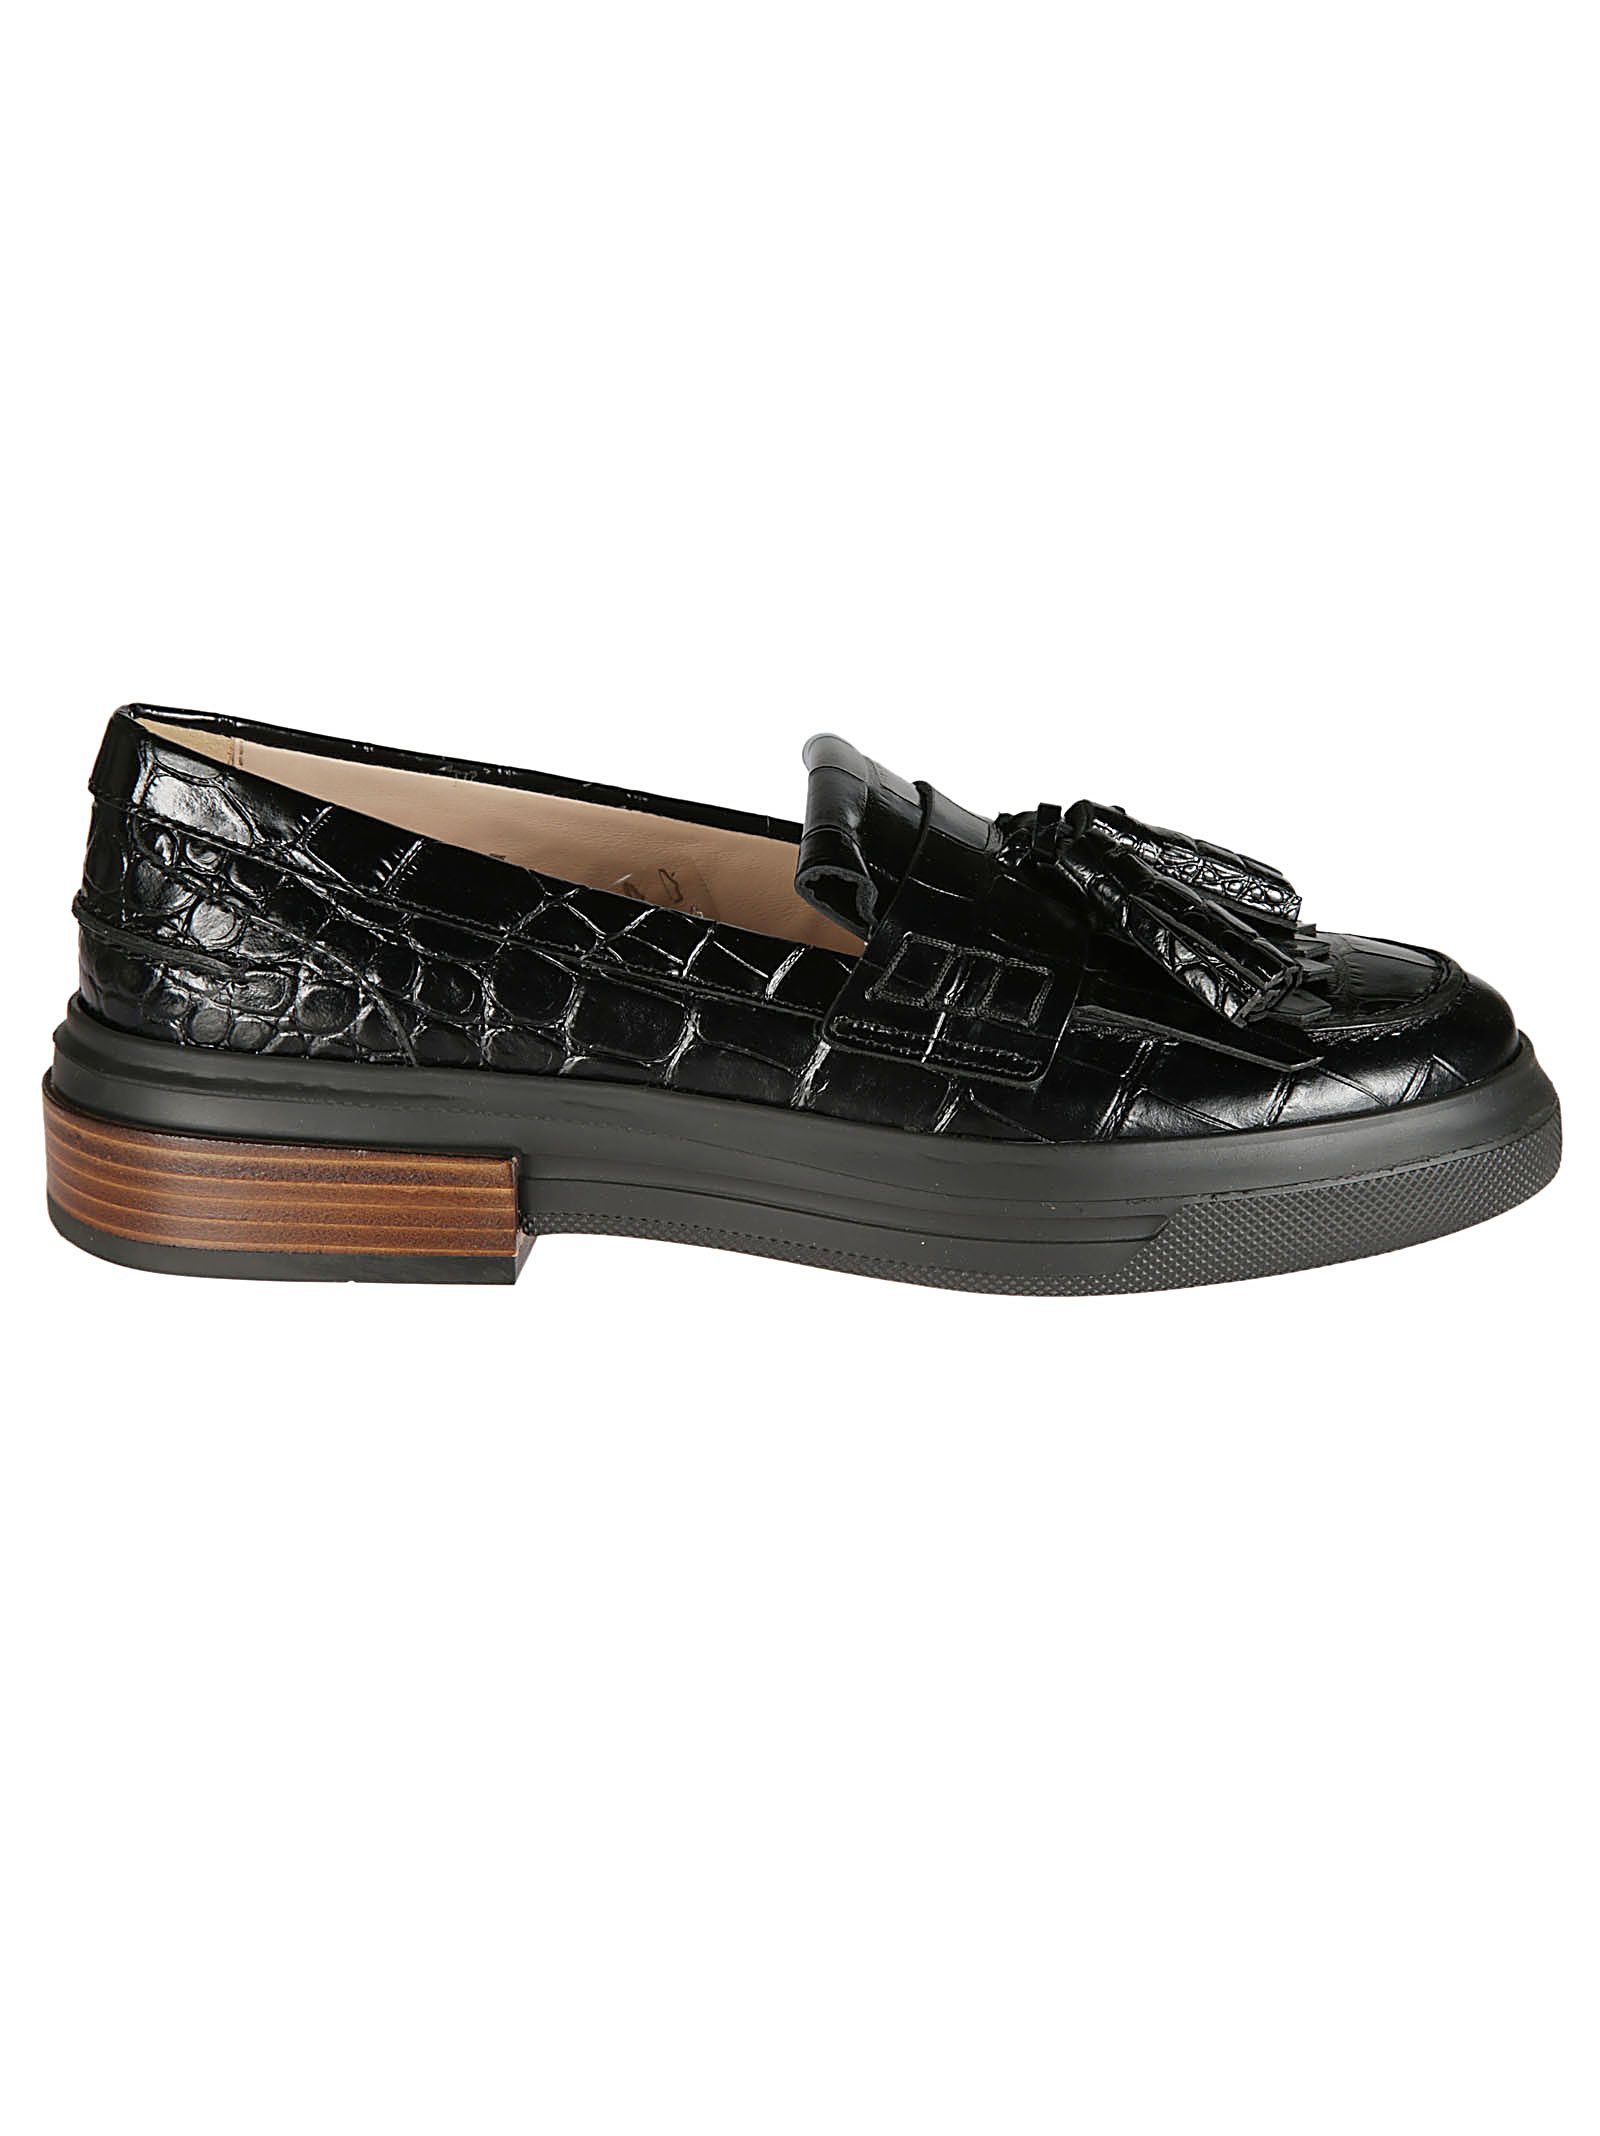 Tod's Tassel Detailed Crocodile Loafers